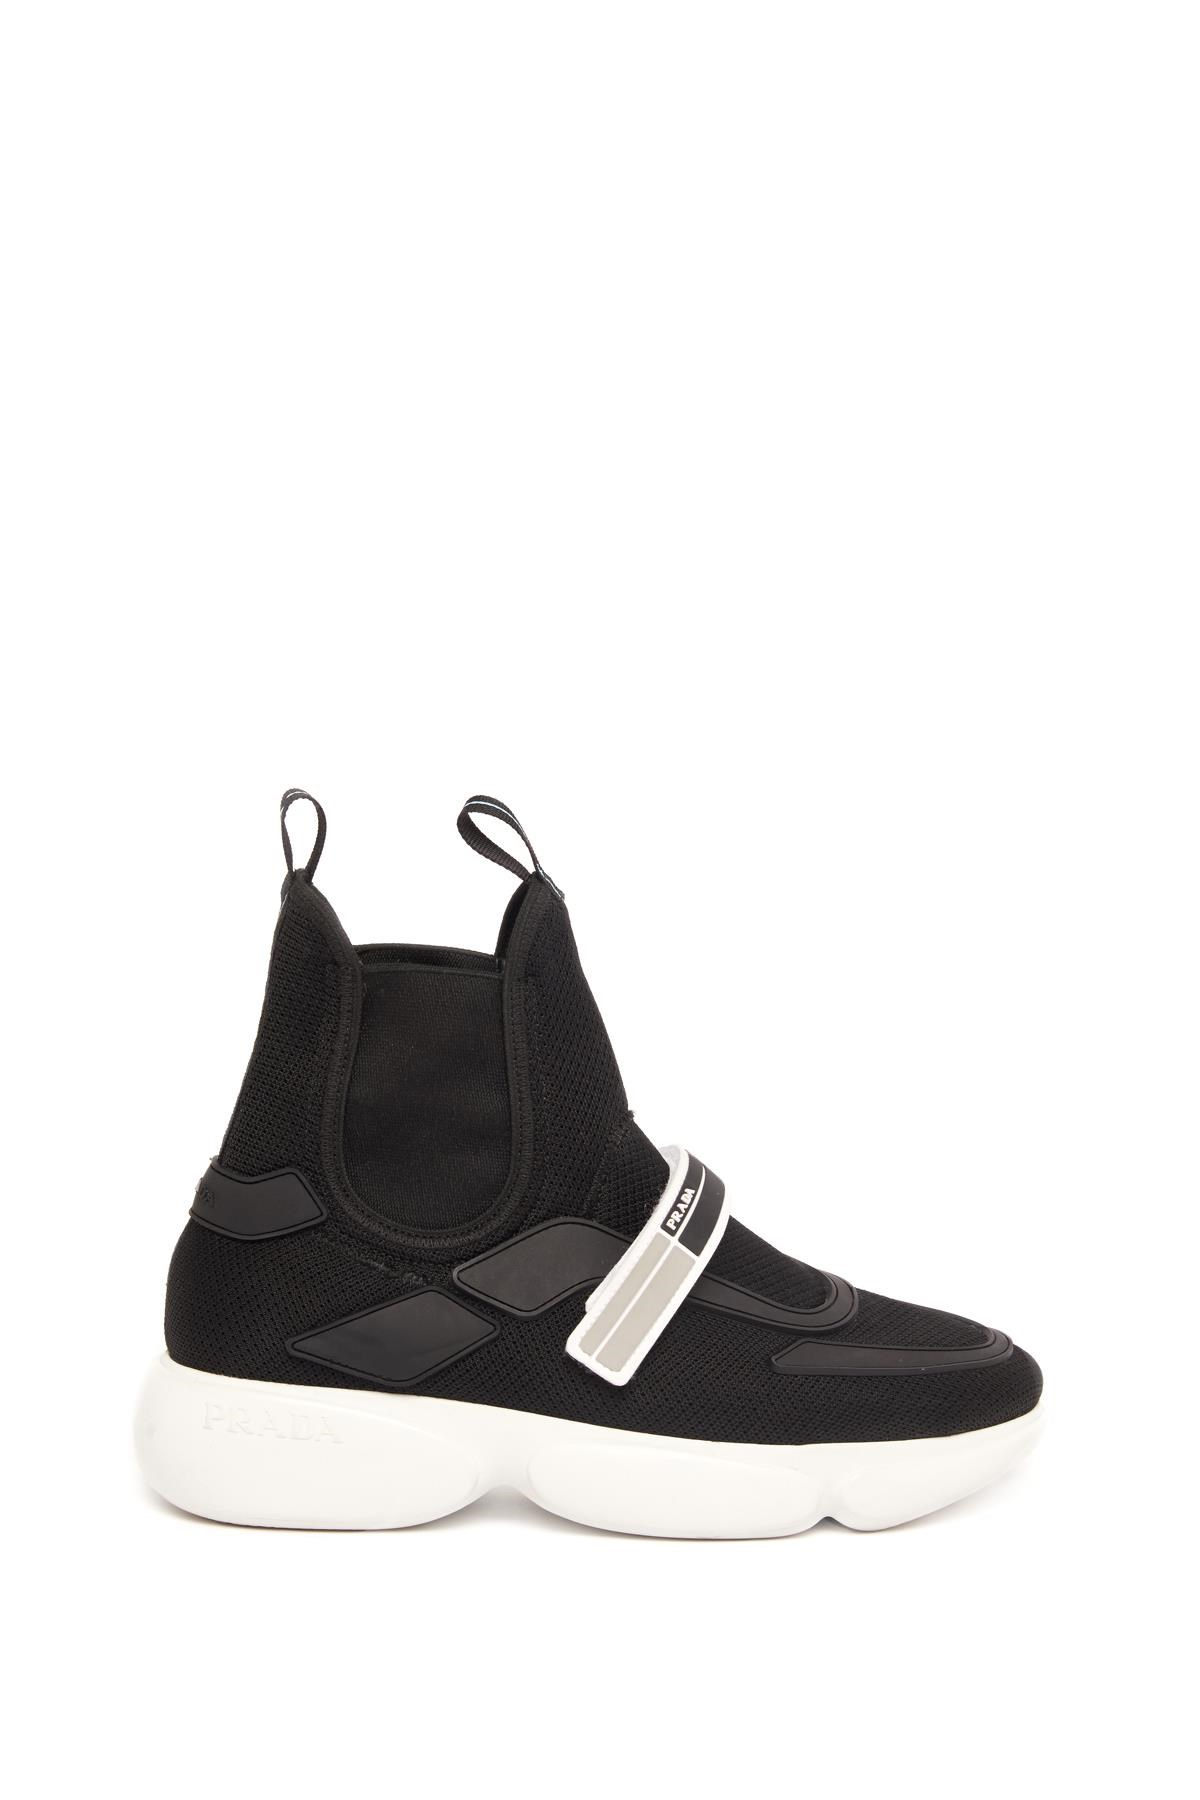 prada sneaker  cloudbust  su julian-fashion.com - 51097 d4efec0b4a7